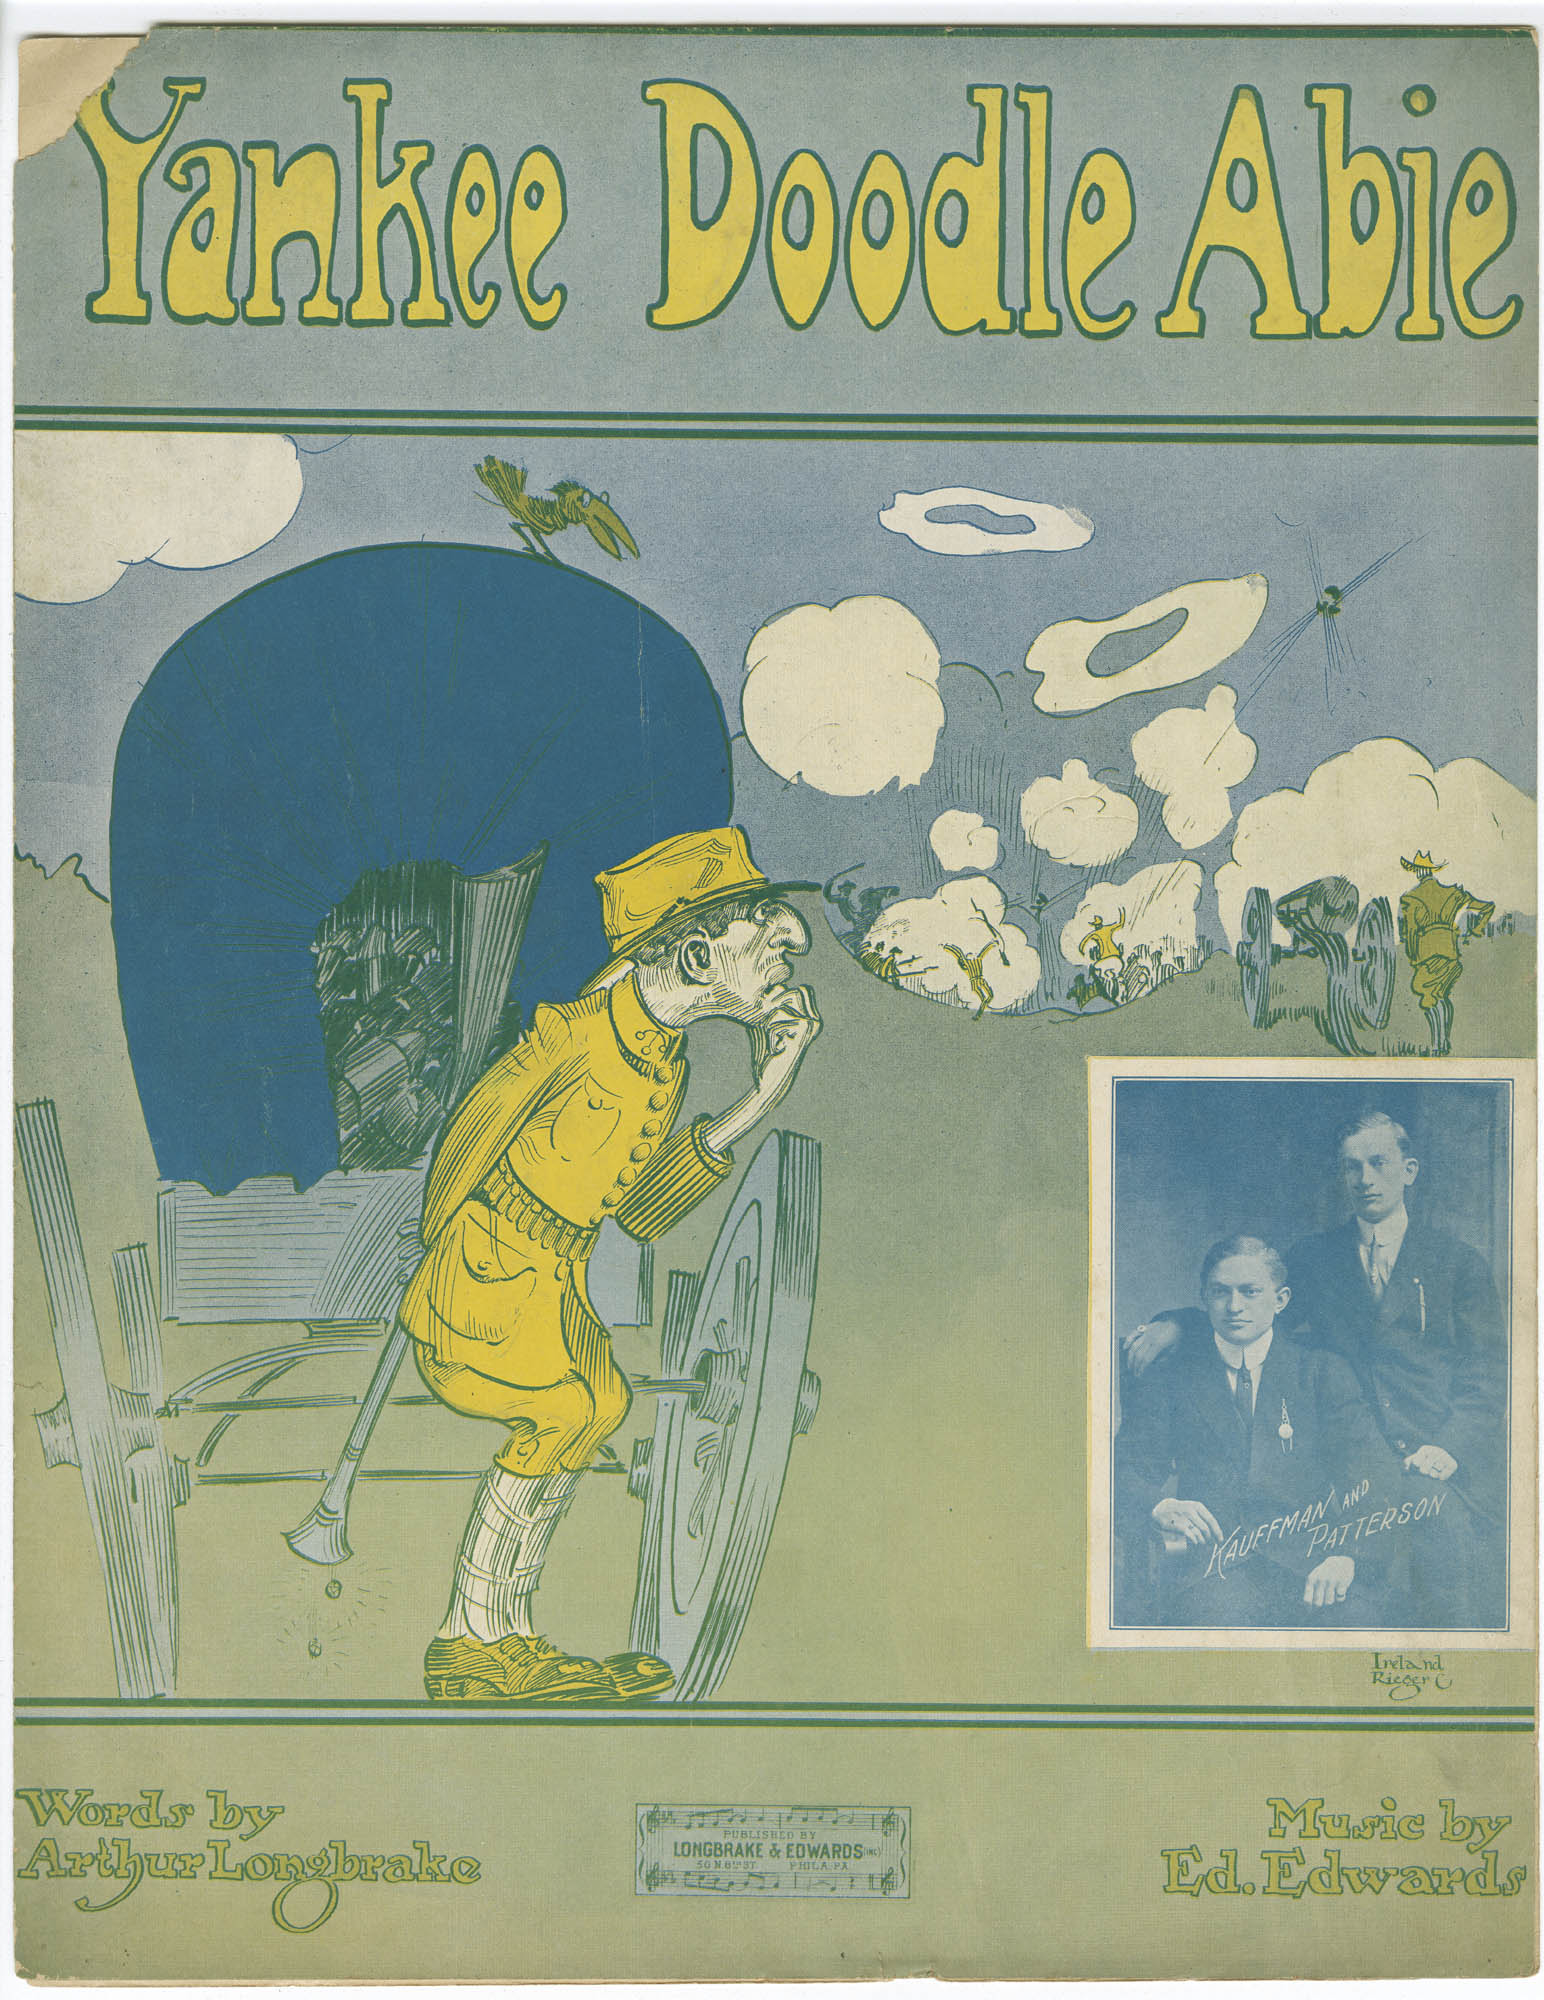 Yankee Doodle Abie